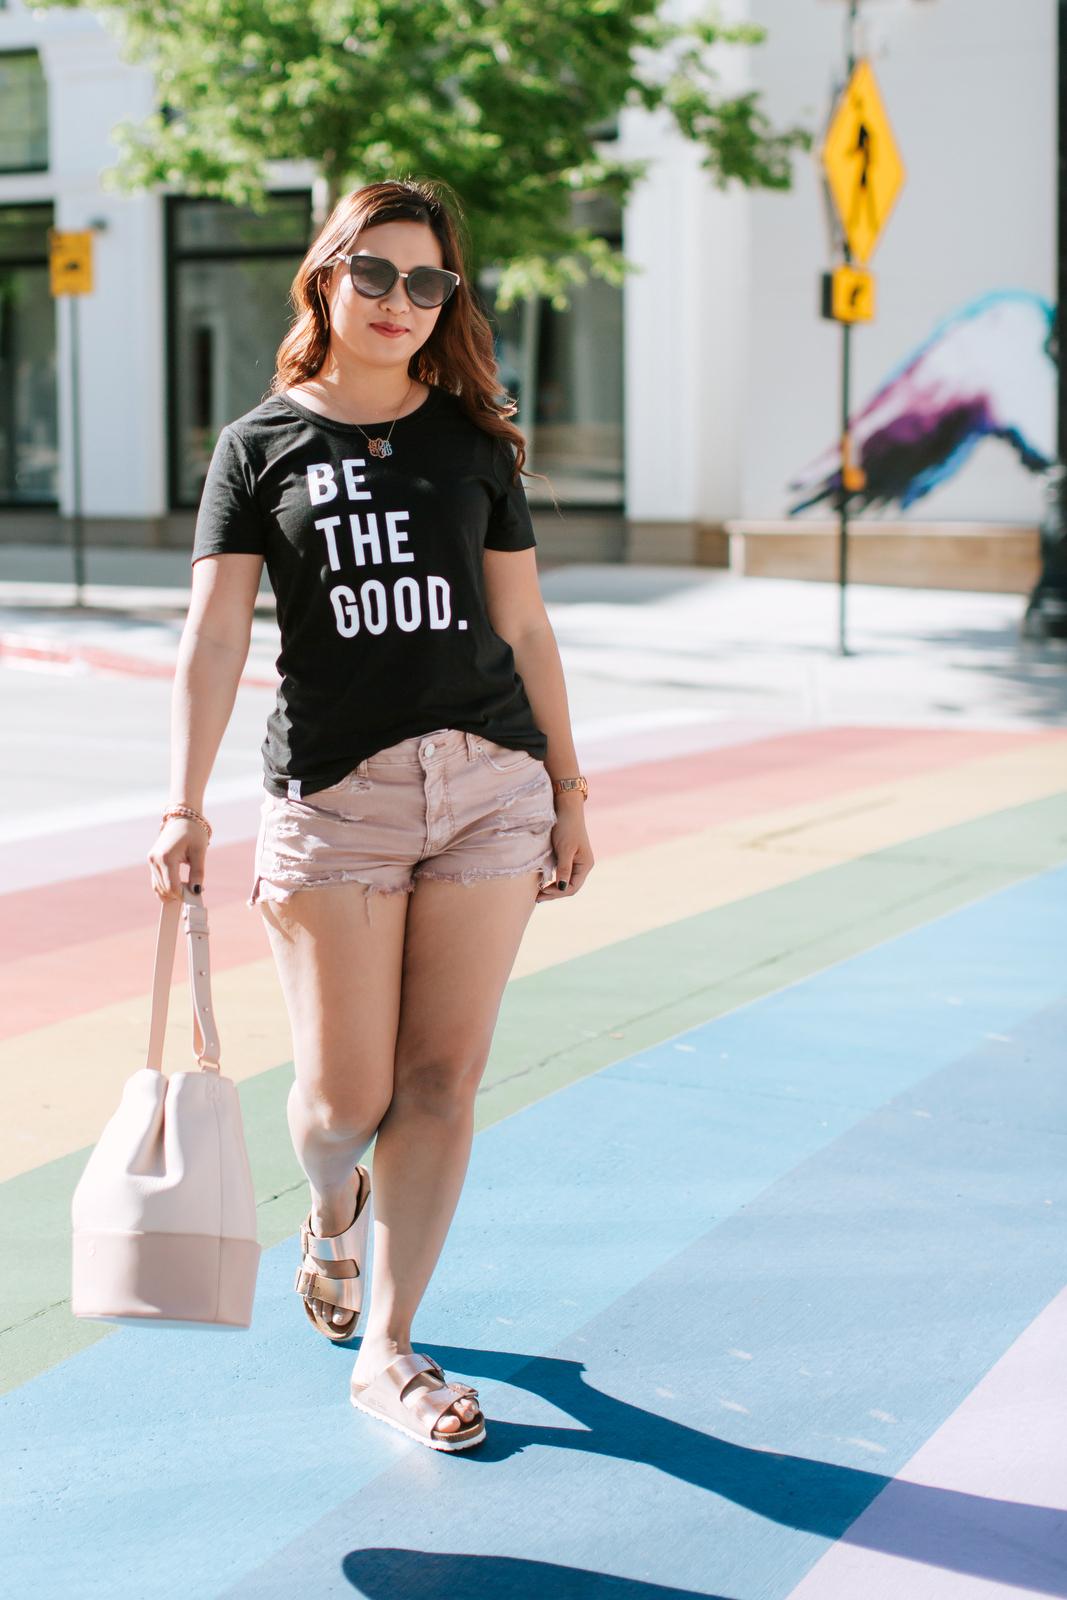 Why I Choose To Be The Good by Utah fashion blogger SandyALaMode